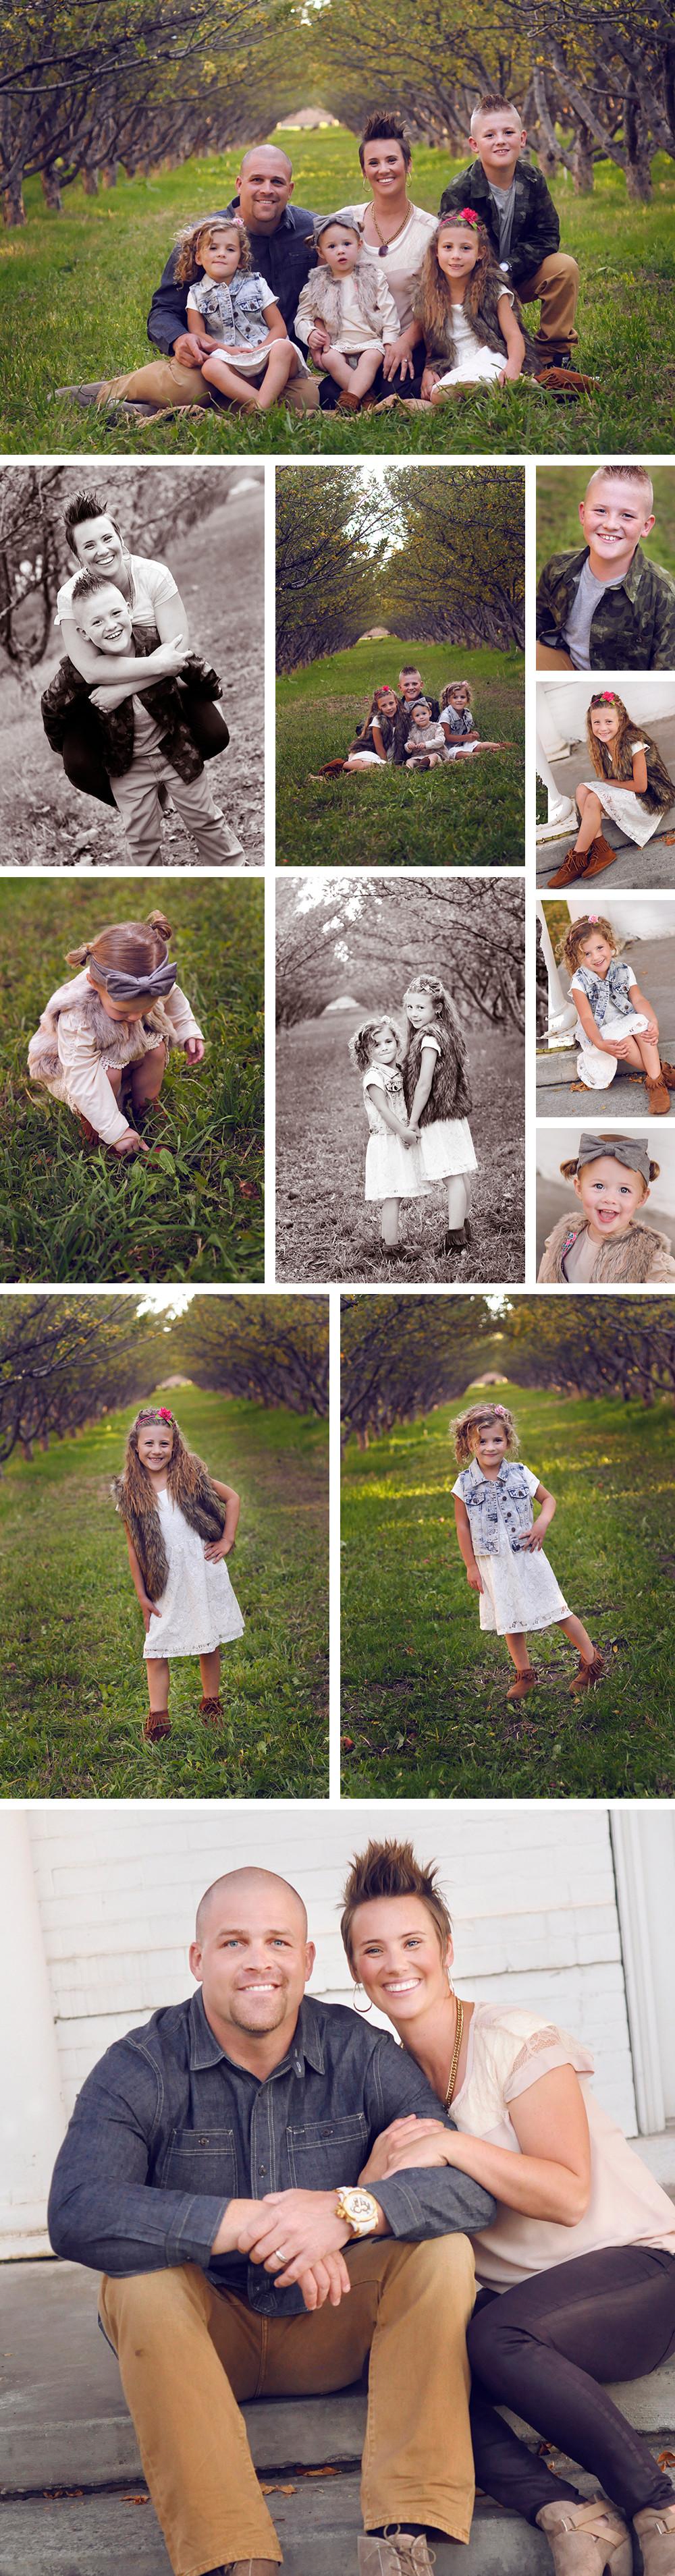 bunkall blog collage.jpg